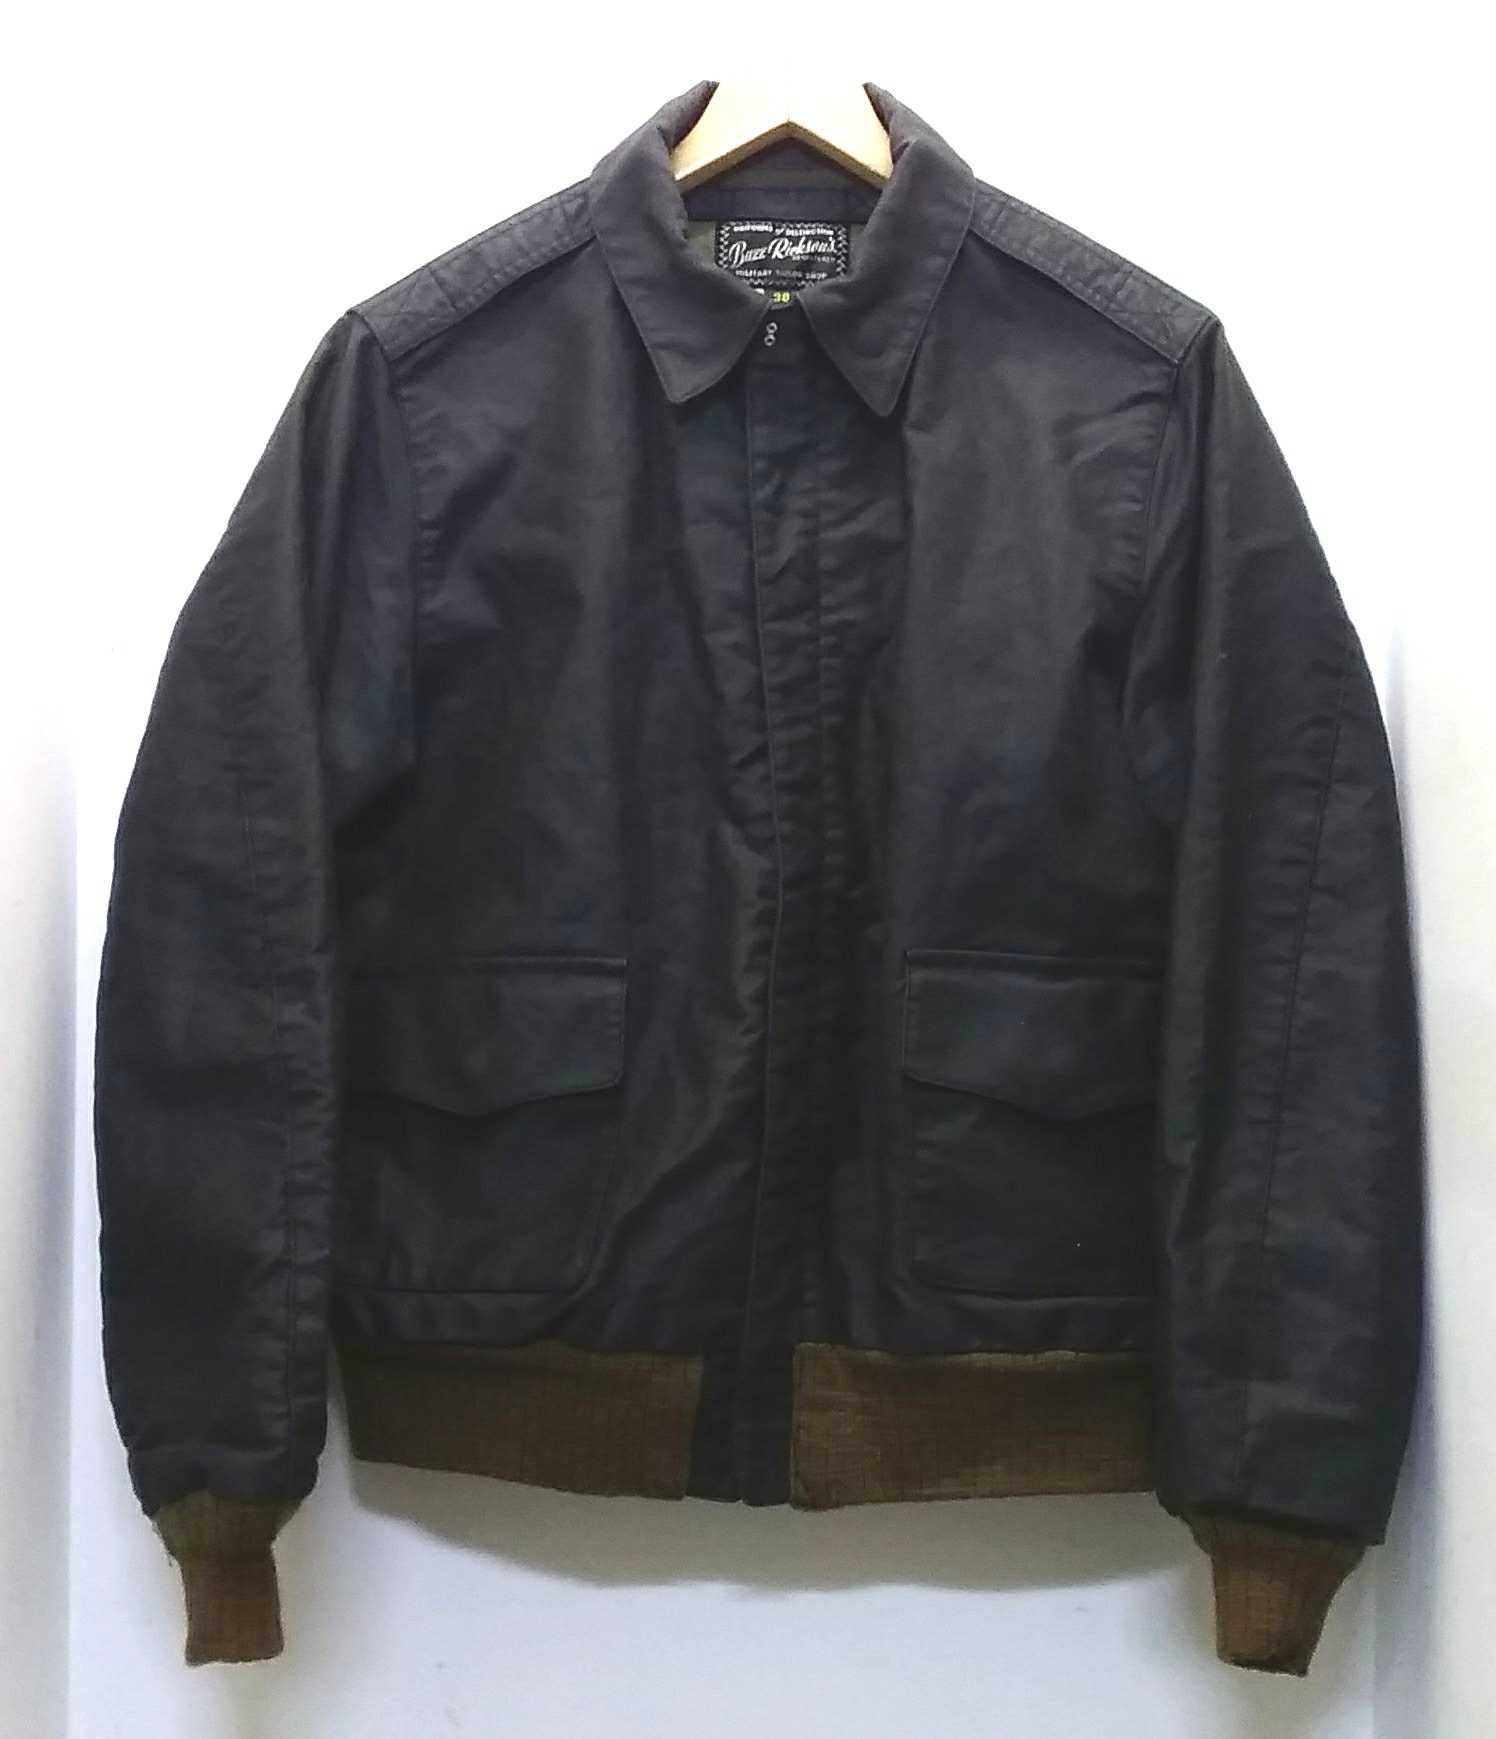 JUNGLE CLOTH BLACK A-2|BUZZ RICKSON'S